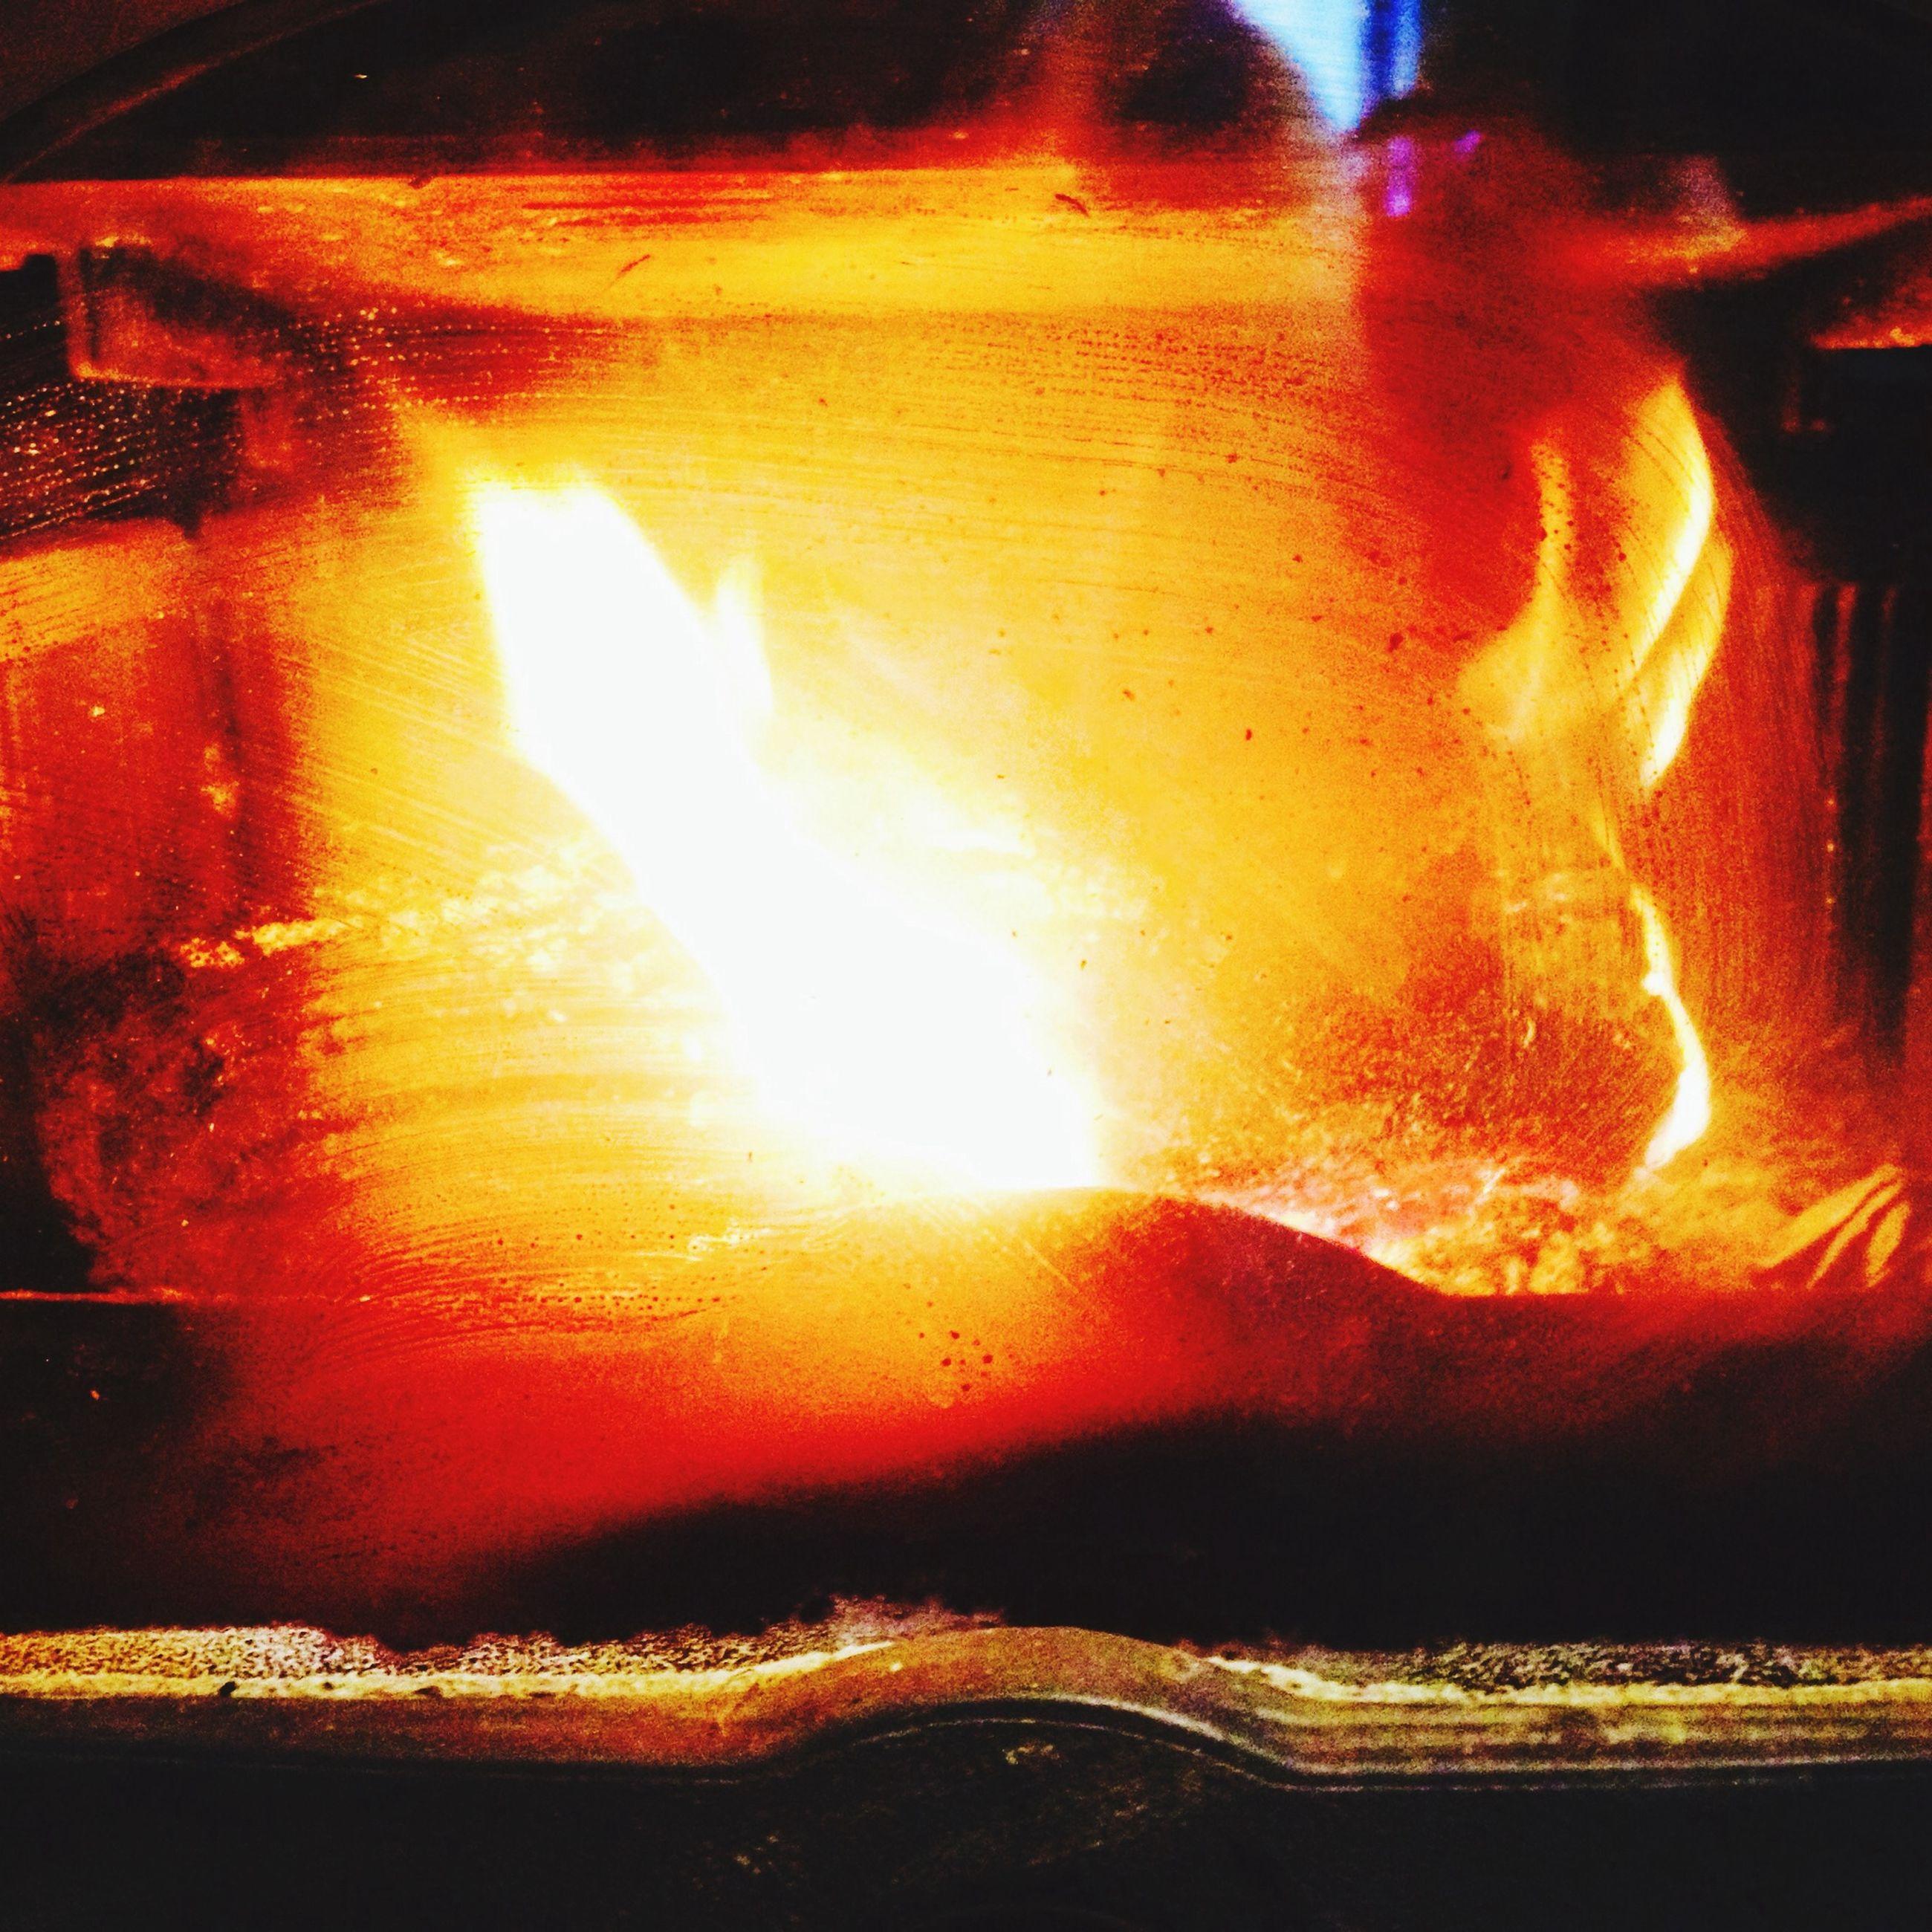 flame, heat - temperature, burning, orange color, glowing, fire - natural phenomenon, indoors, illuminated, motion, close-up, lens flare, sunset, transportation, car, yellow, sunlight, red, sunbeam, light - natural phenomenon, no people